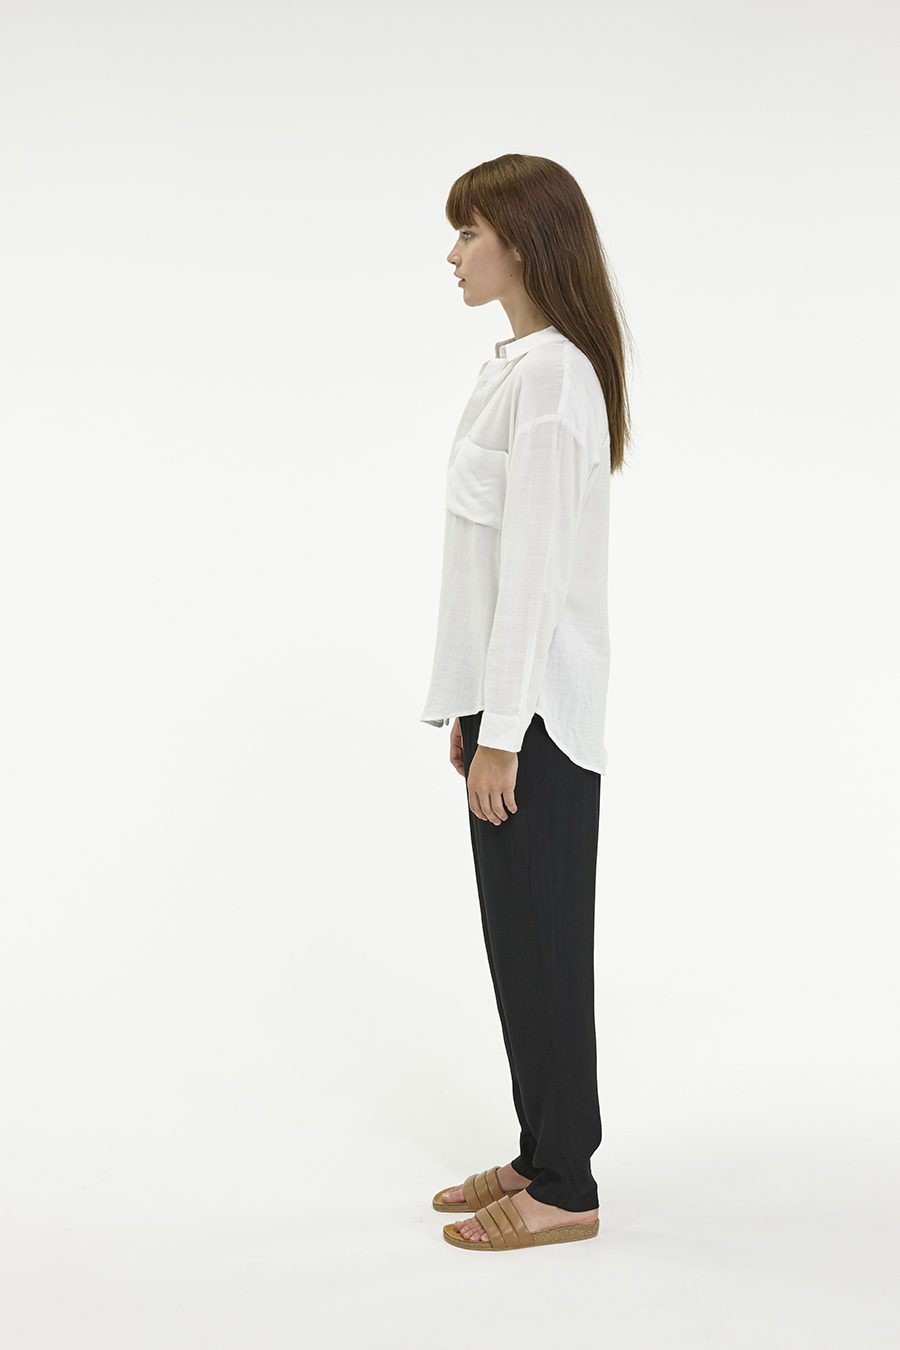 Huffer_Q3-16_W-Rome-Shirt_White-02